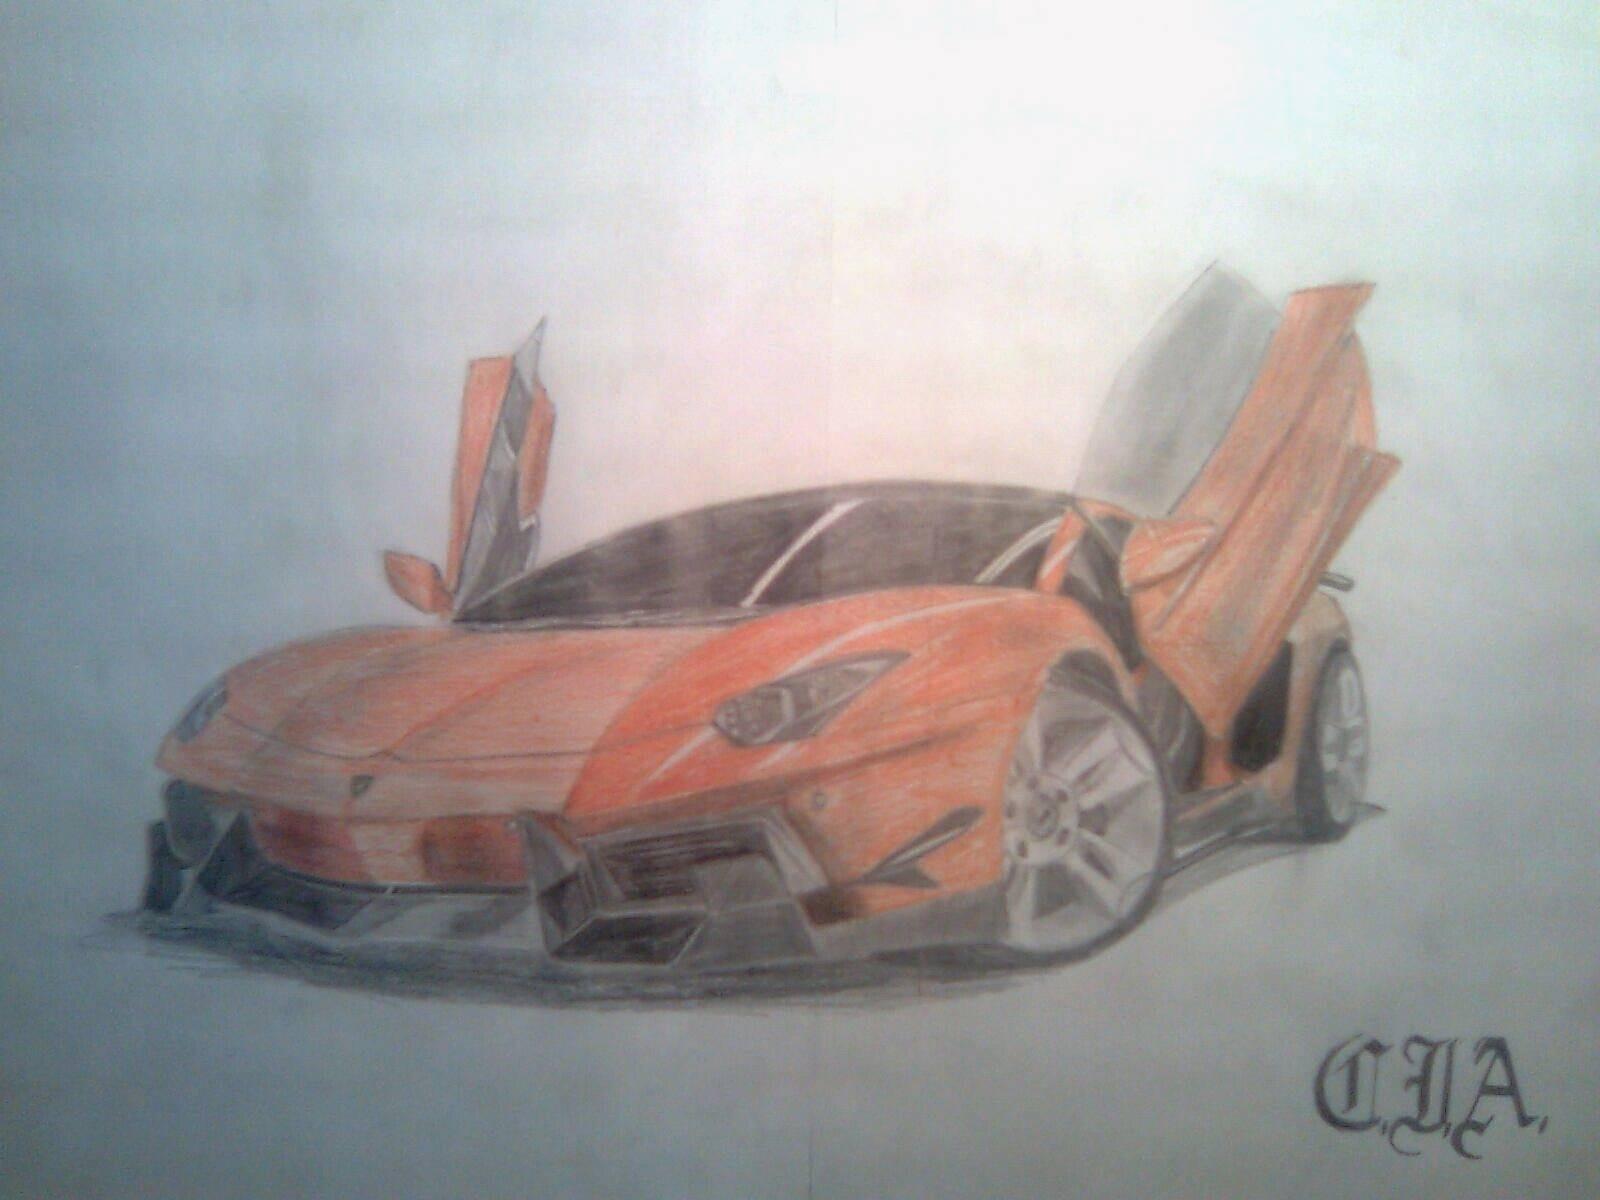 Lamborghini Zum Ausmalen Das Beste Von 25 Liebenswert Ausmalbilder Zum Ausdrucken Lamborghini Galerie